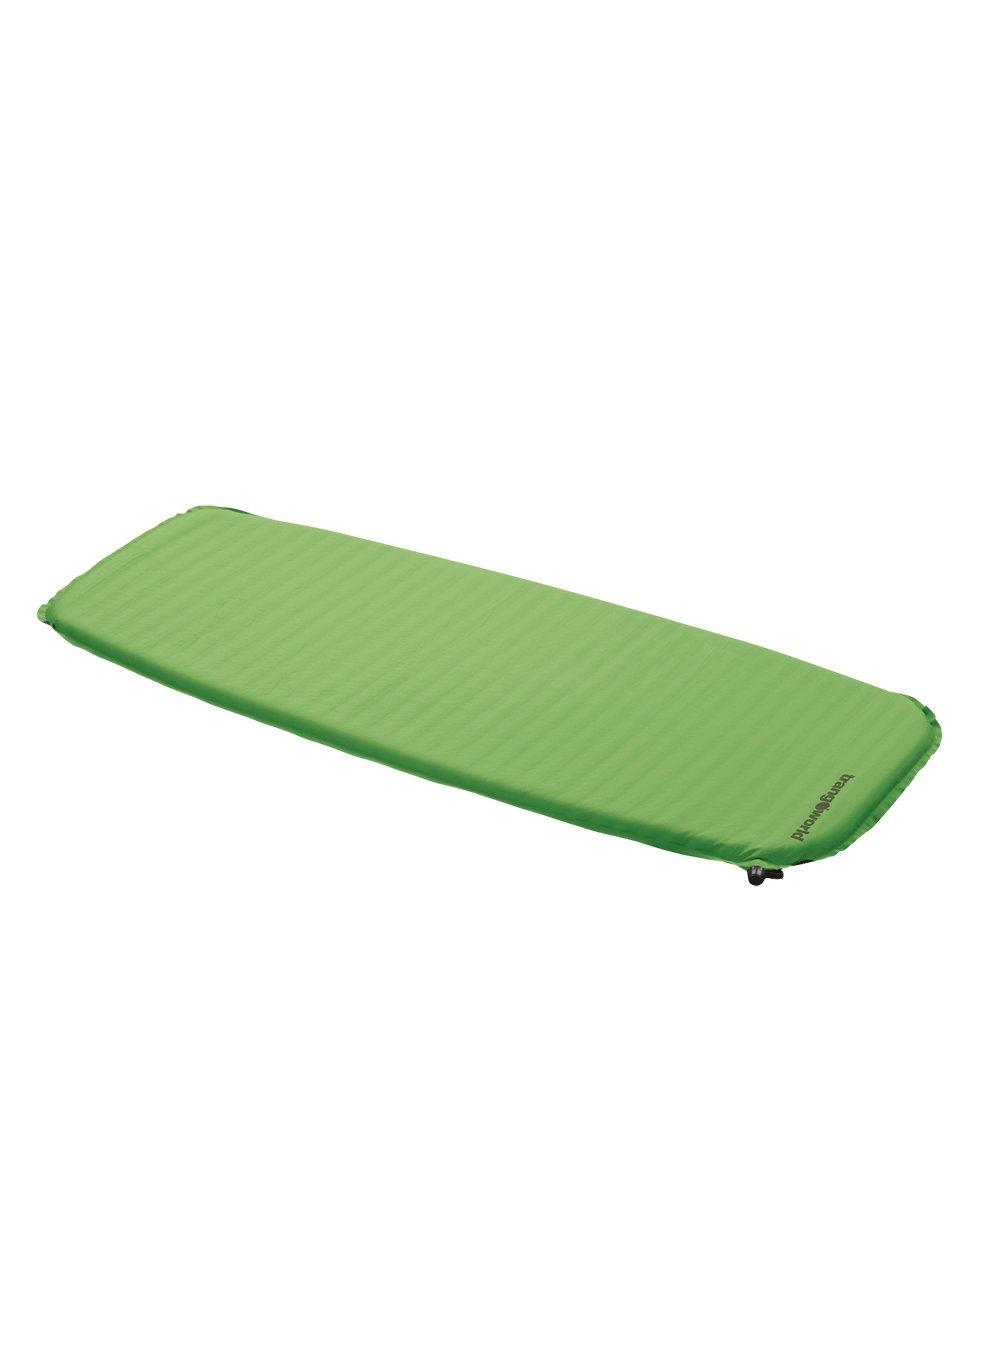 Trango® Micro Lite Matratze grün 120 x 50 x 3